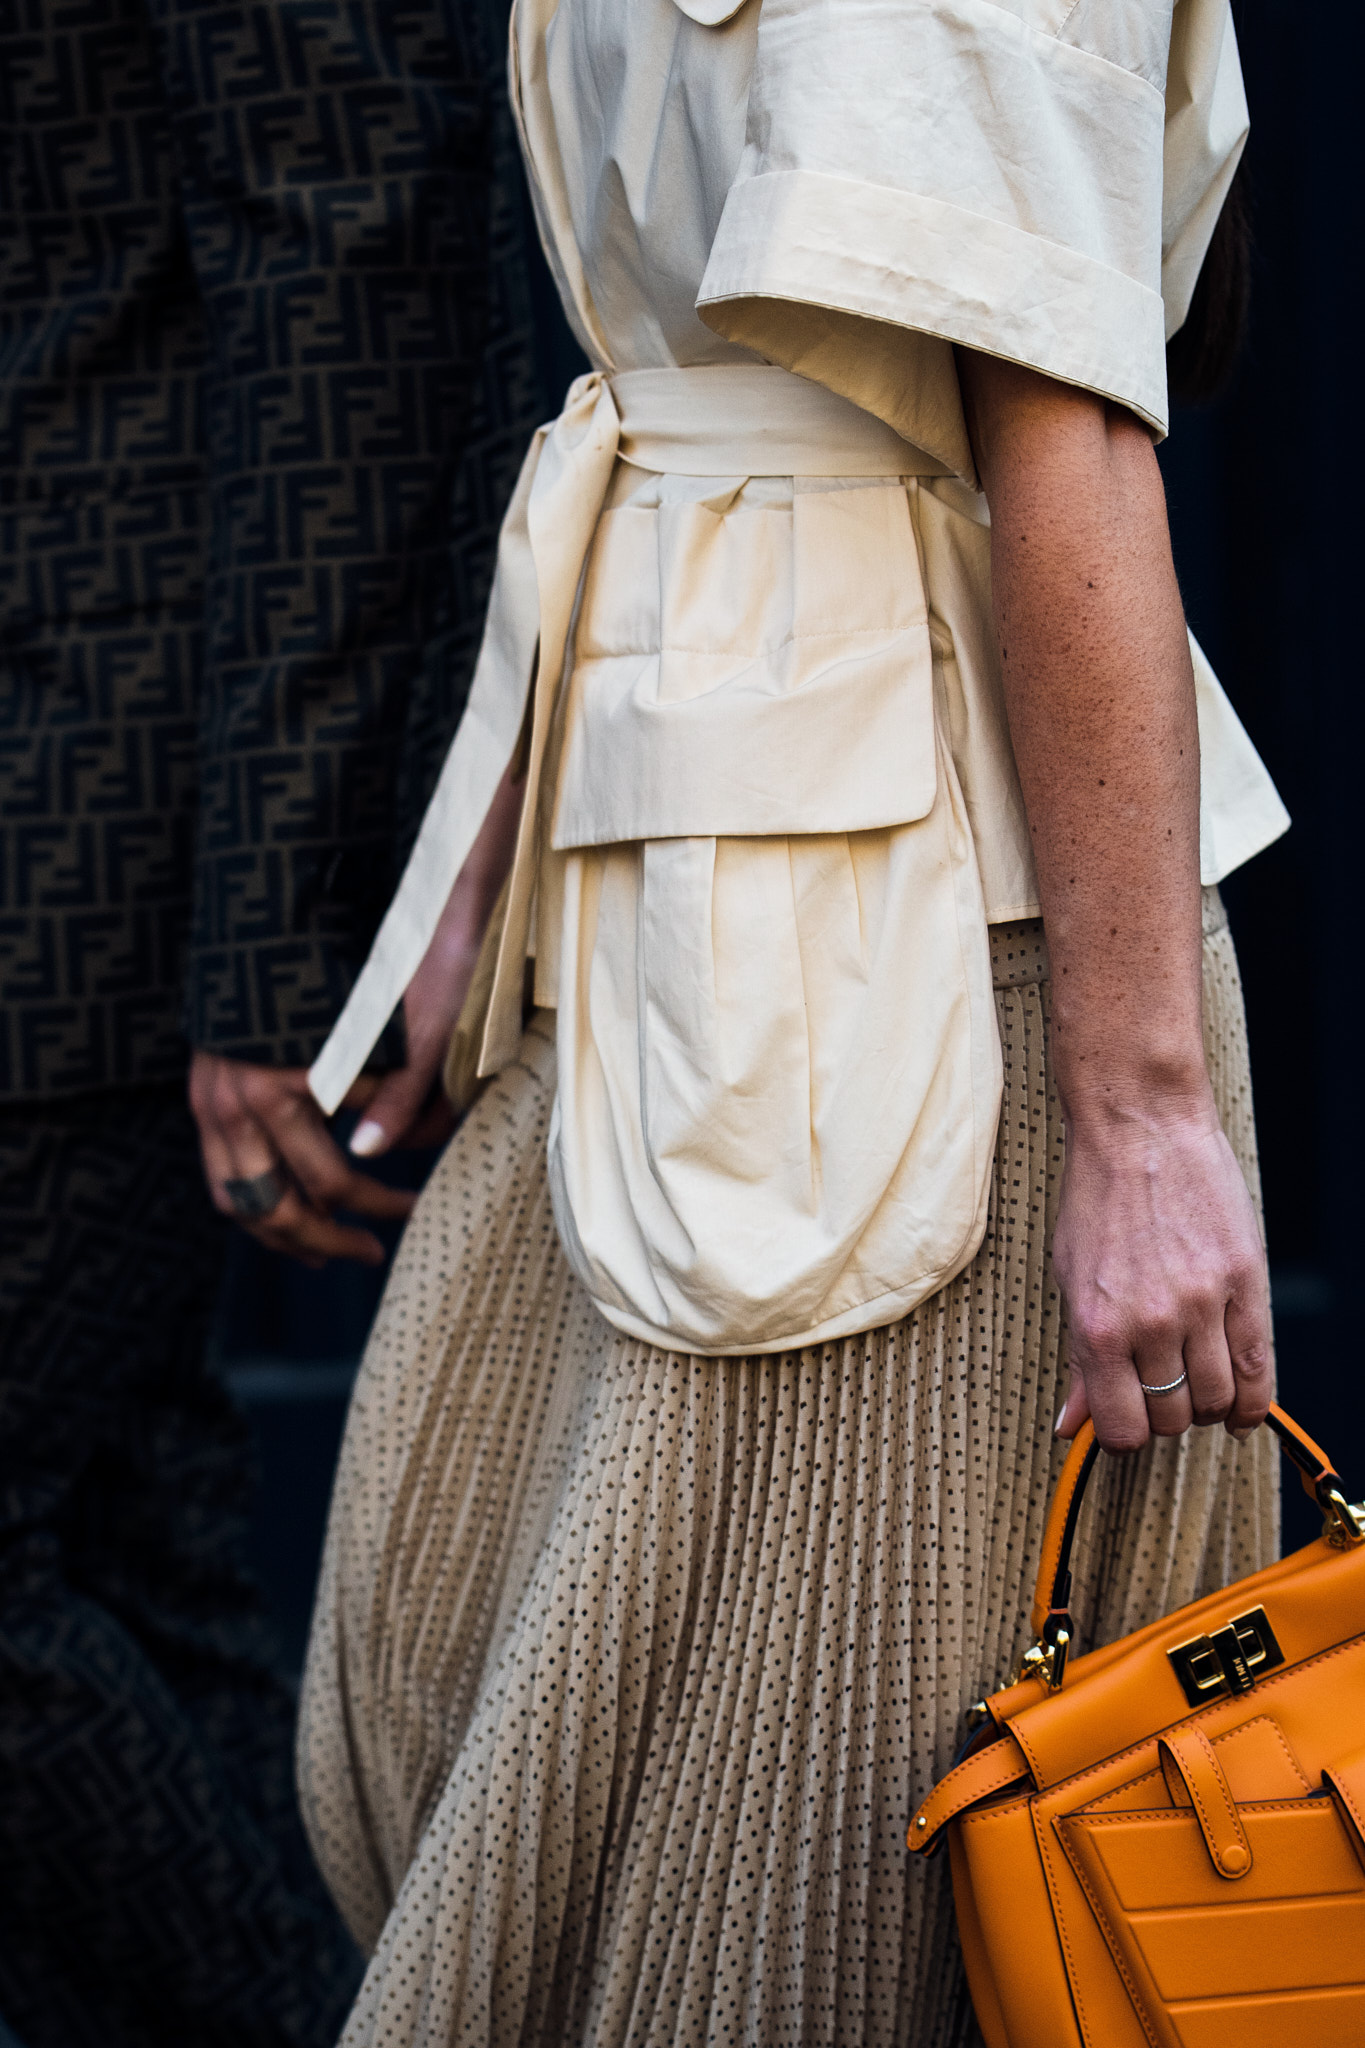 Alice Barbier and js Roques - Outside Fendi - Milan Fashion Week FW19